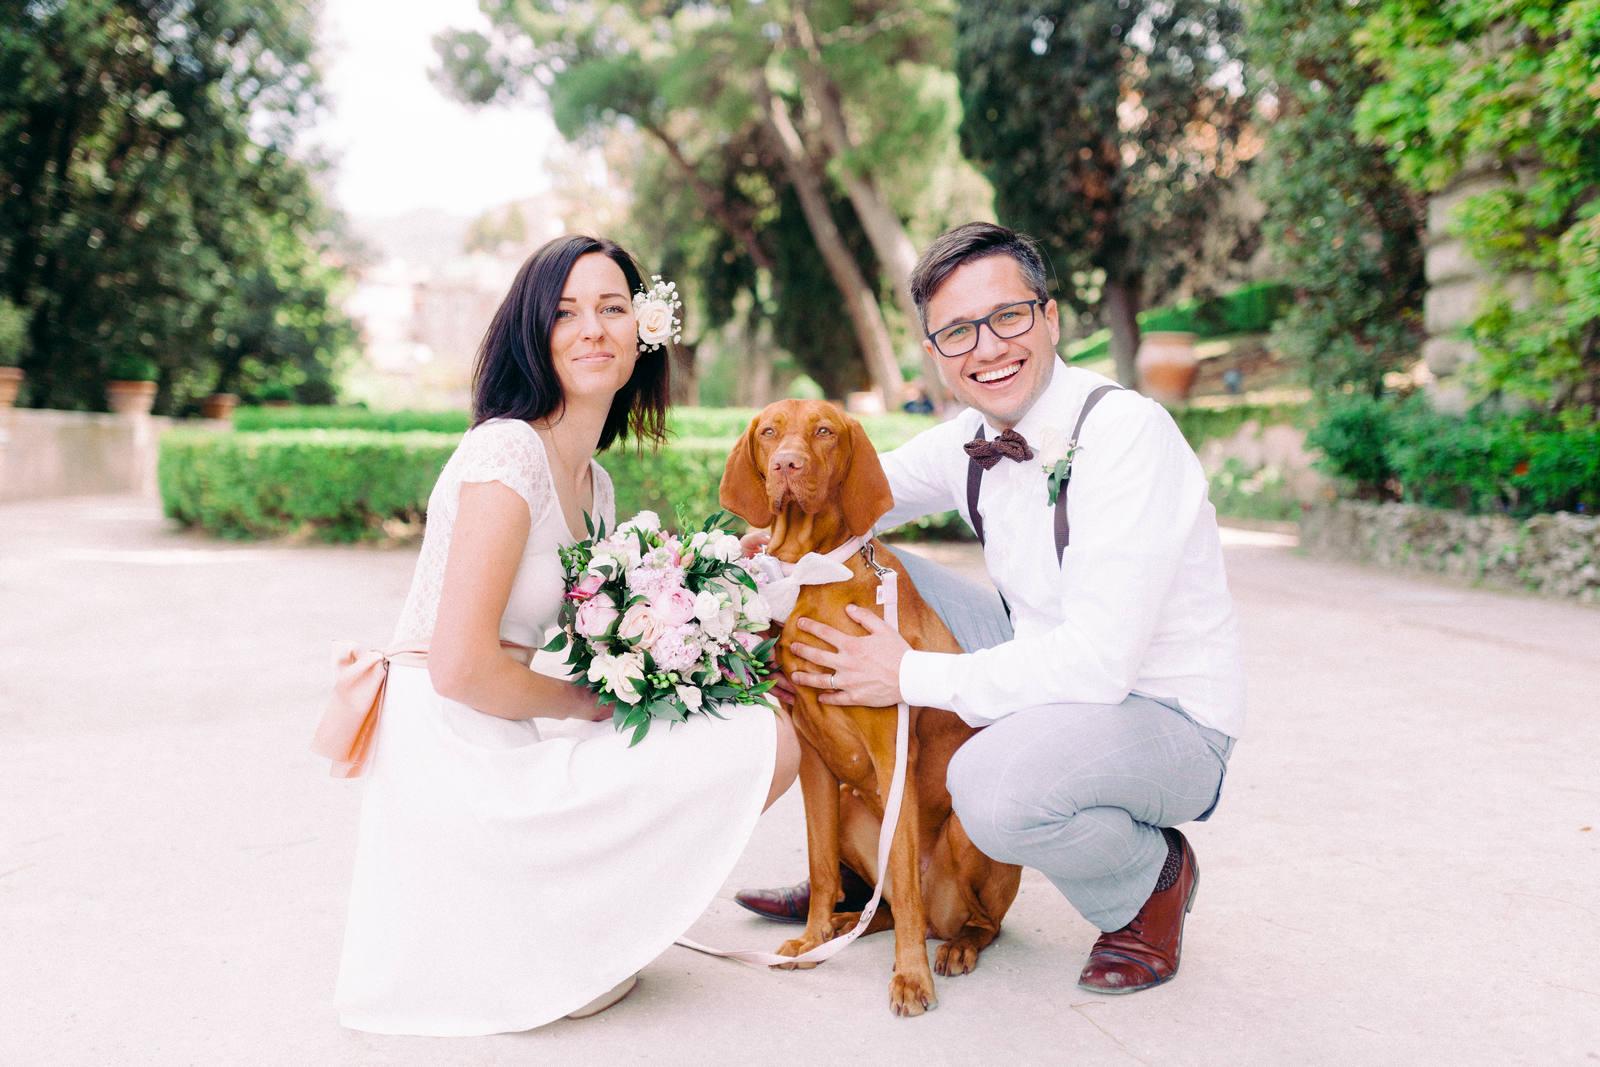 wedding photographer Tivoli (Italy)